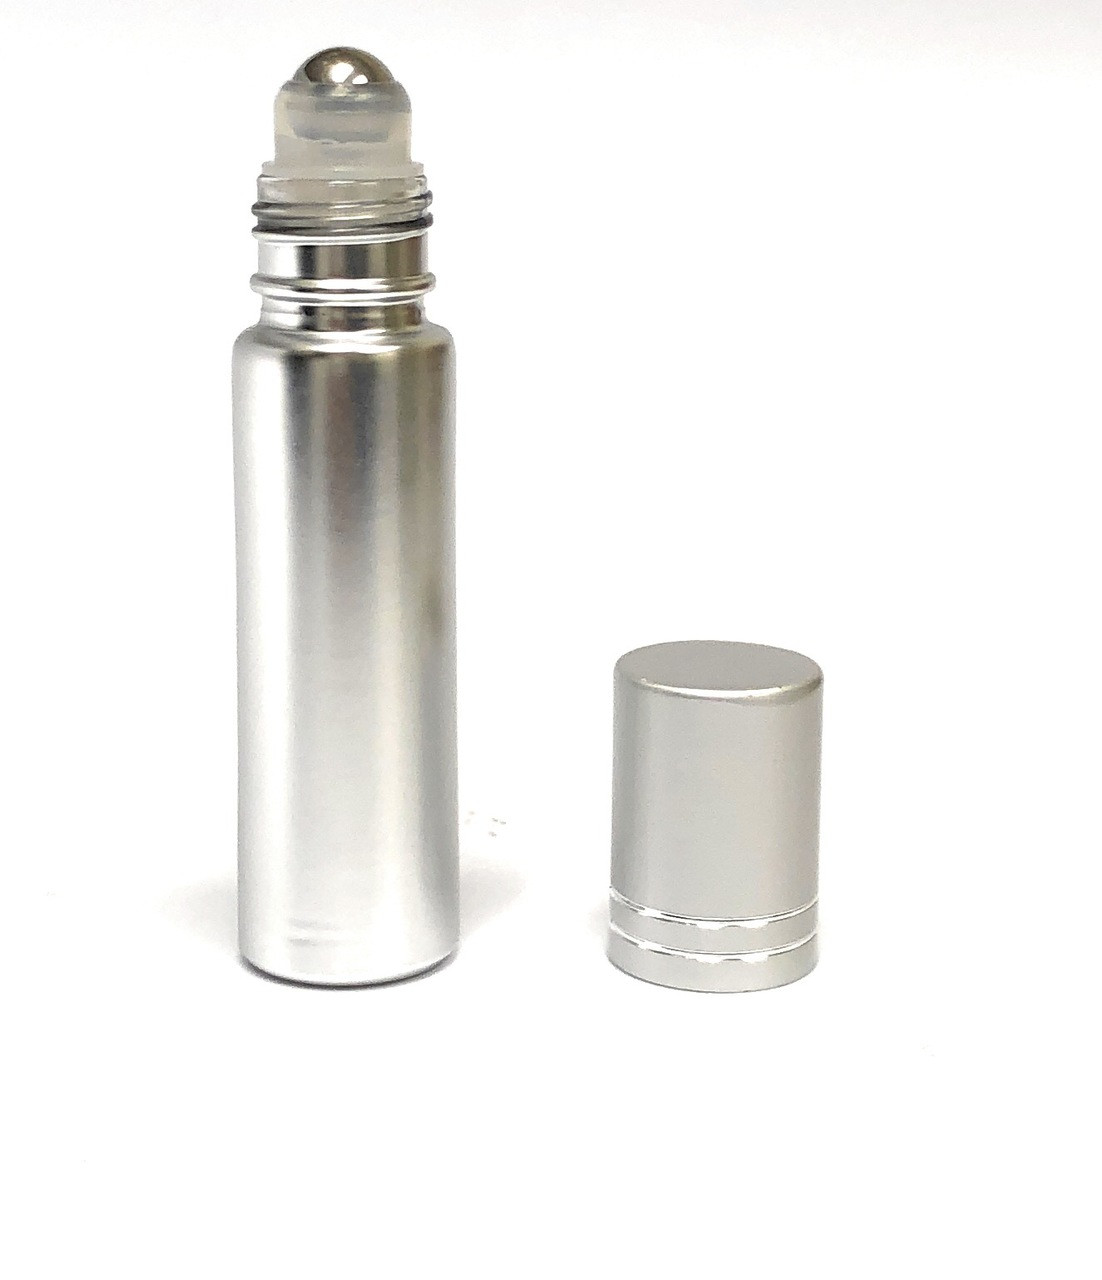 10 ml Silver Metallic Roll on Bottles